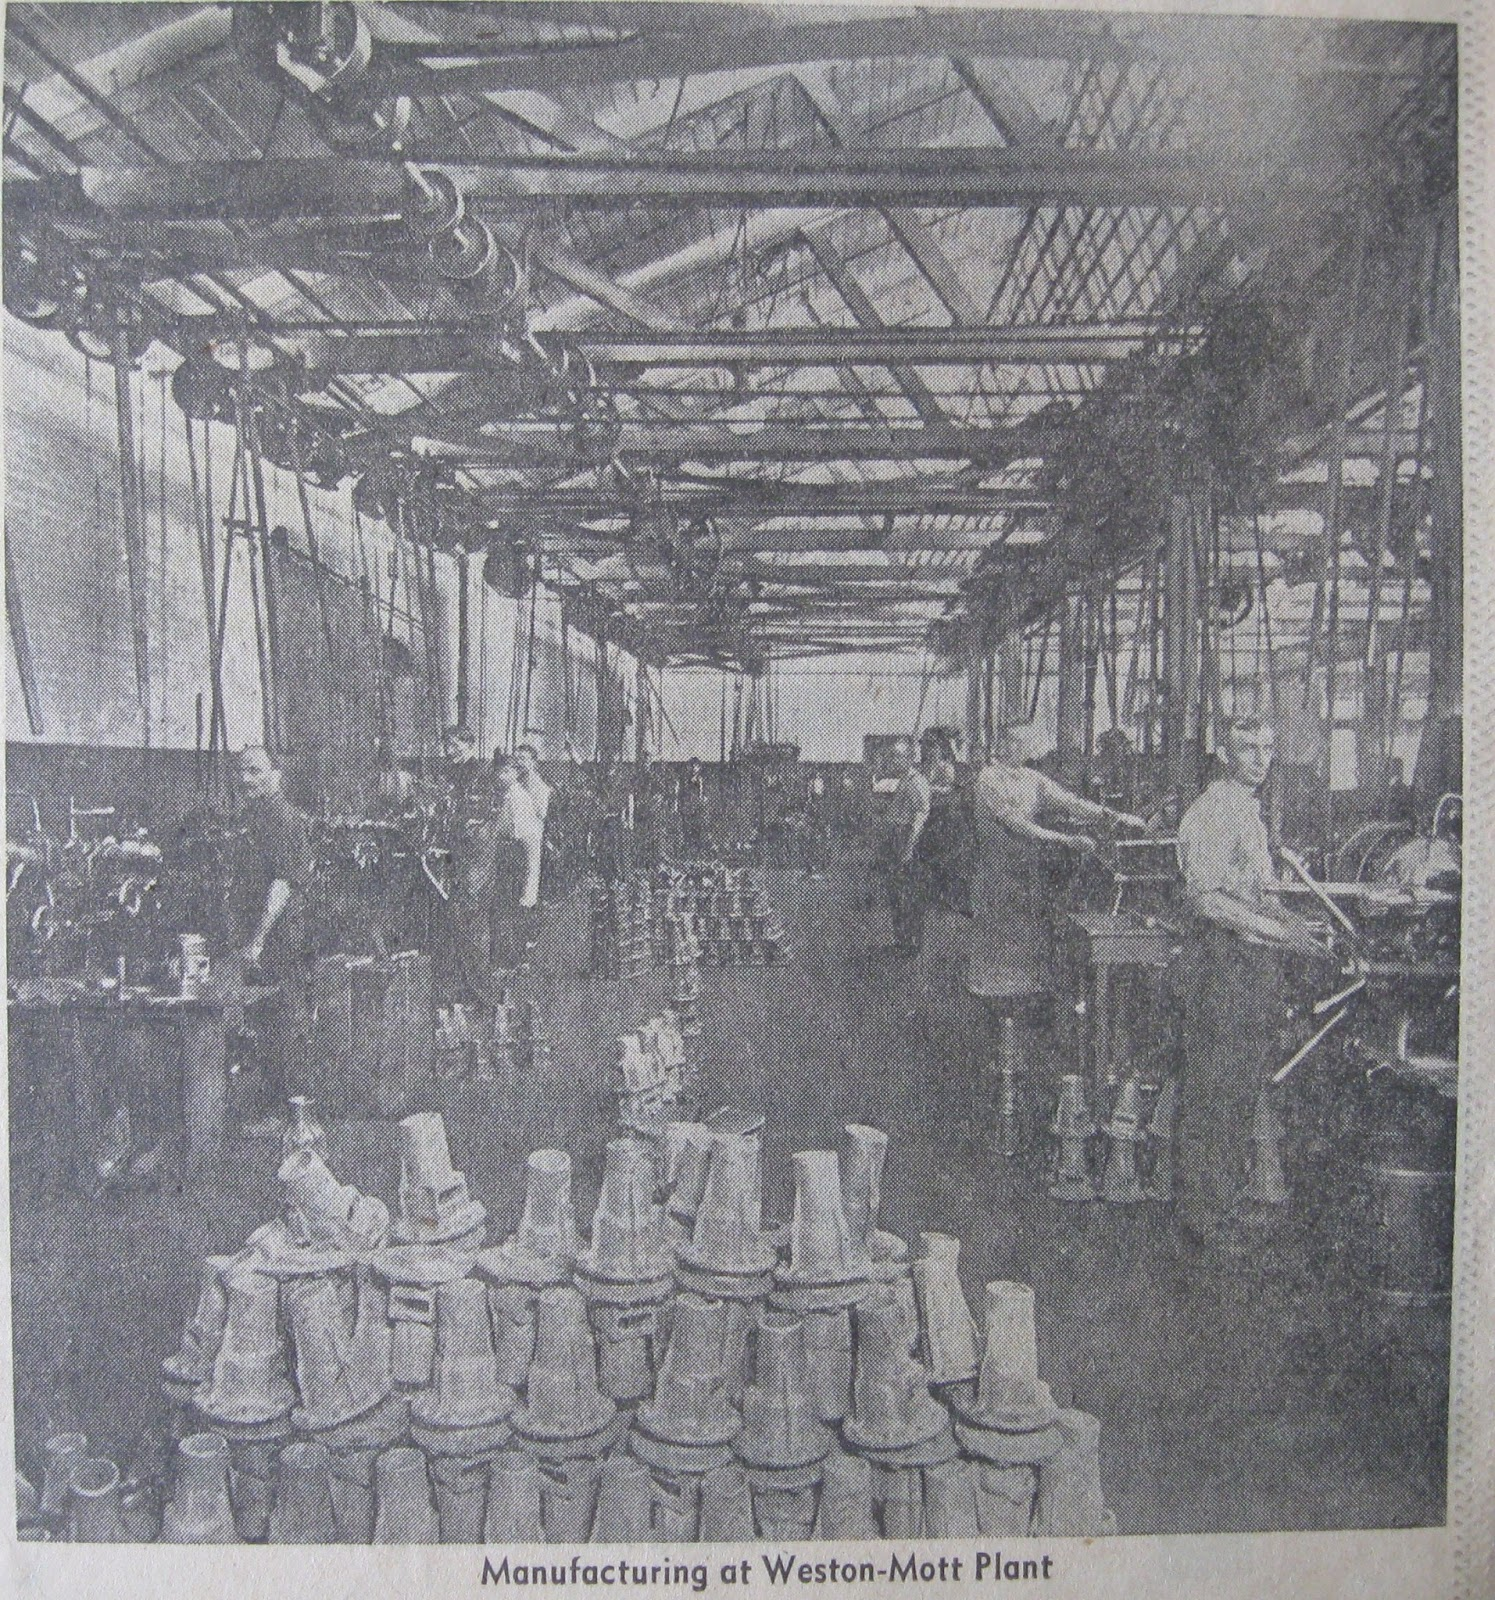 General motors 50th anniversary buick factory history for History of general motors